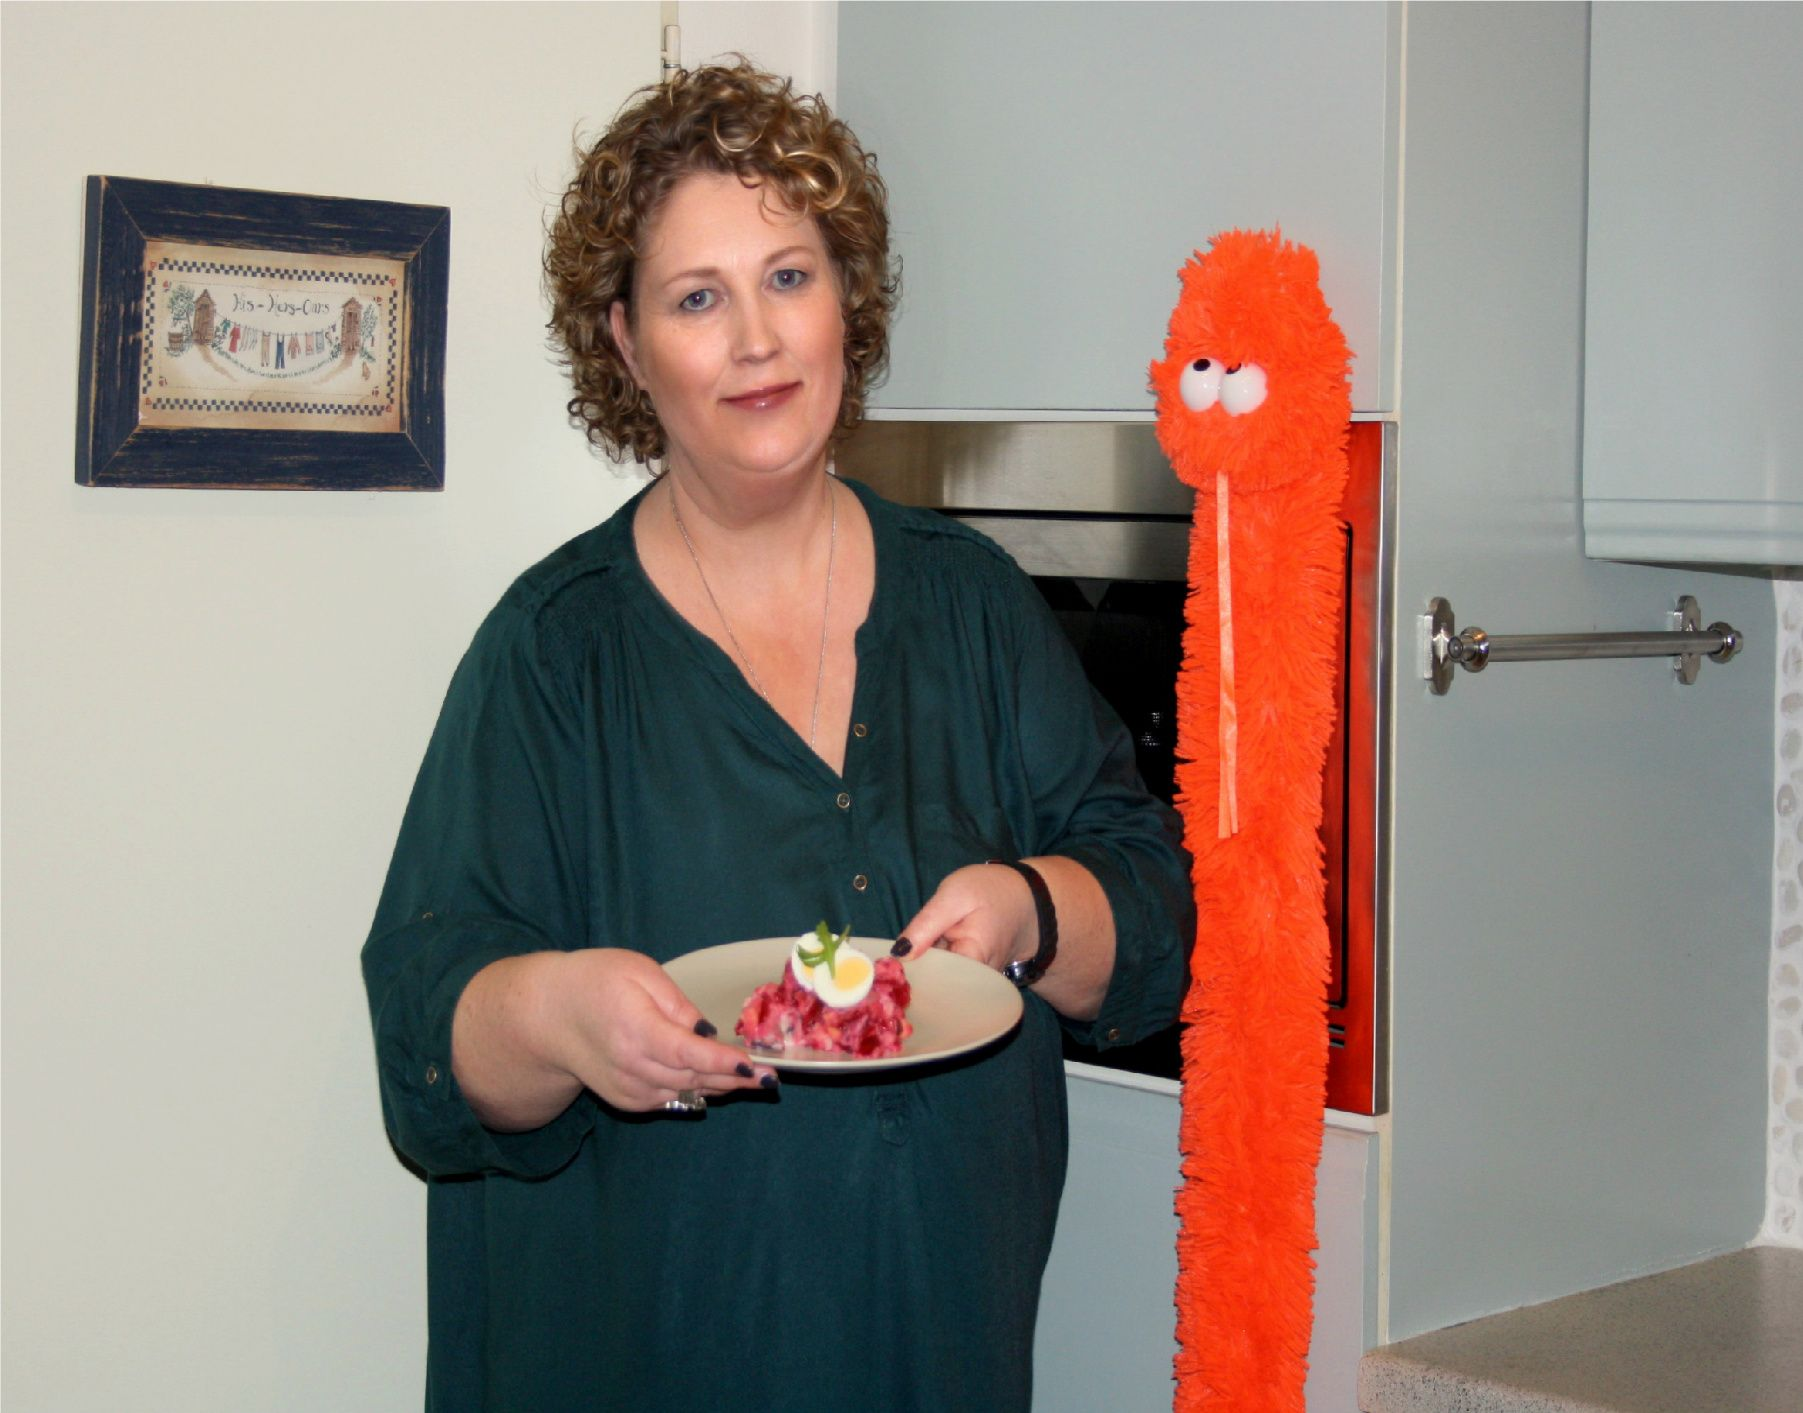 Elianne van den Heuvel from Tegelen, Netherlands made Dutch Herring Salad for the World Cup Cookbook.